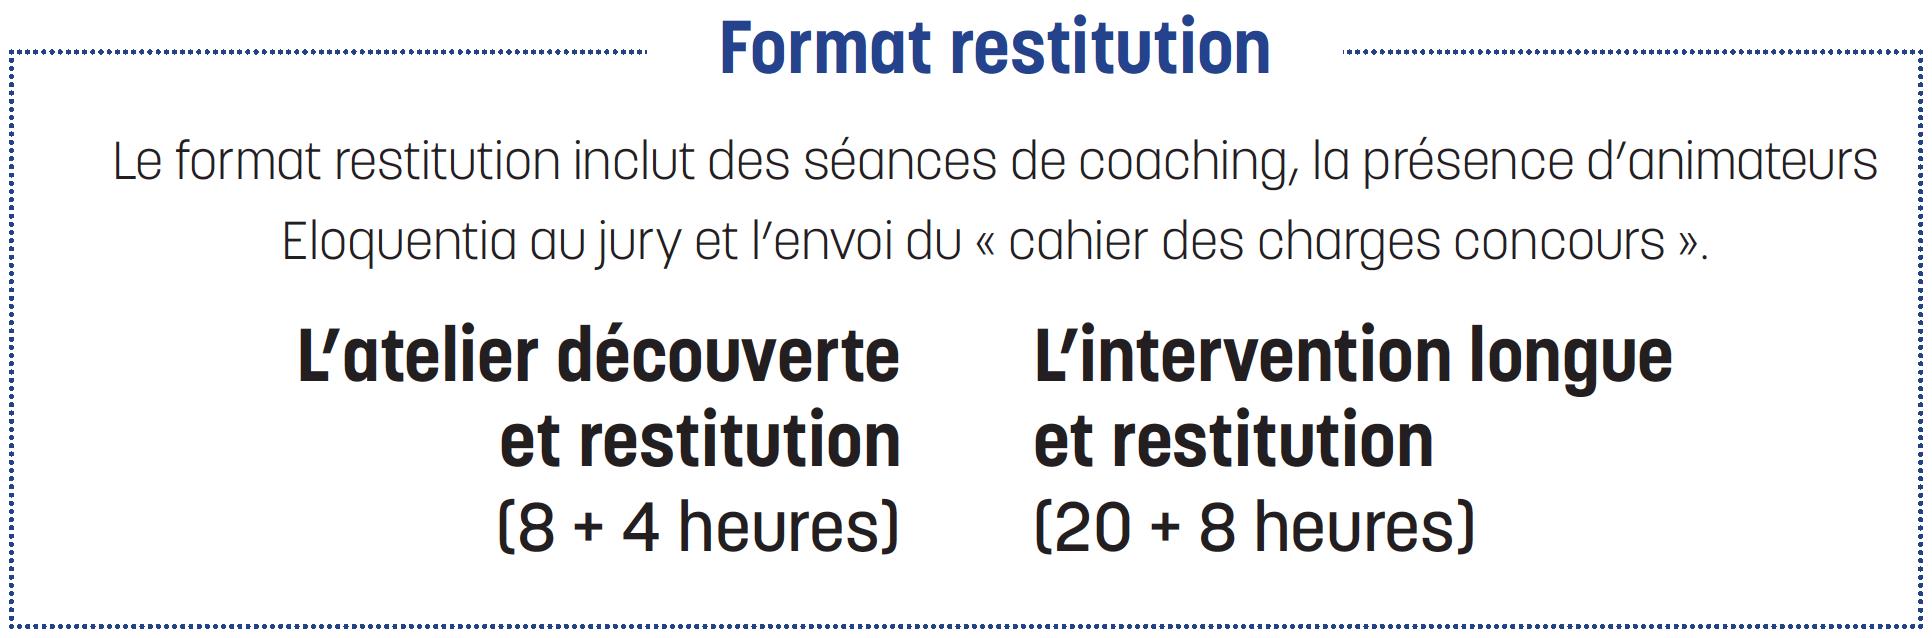 Format restitution